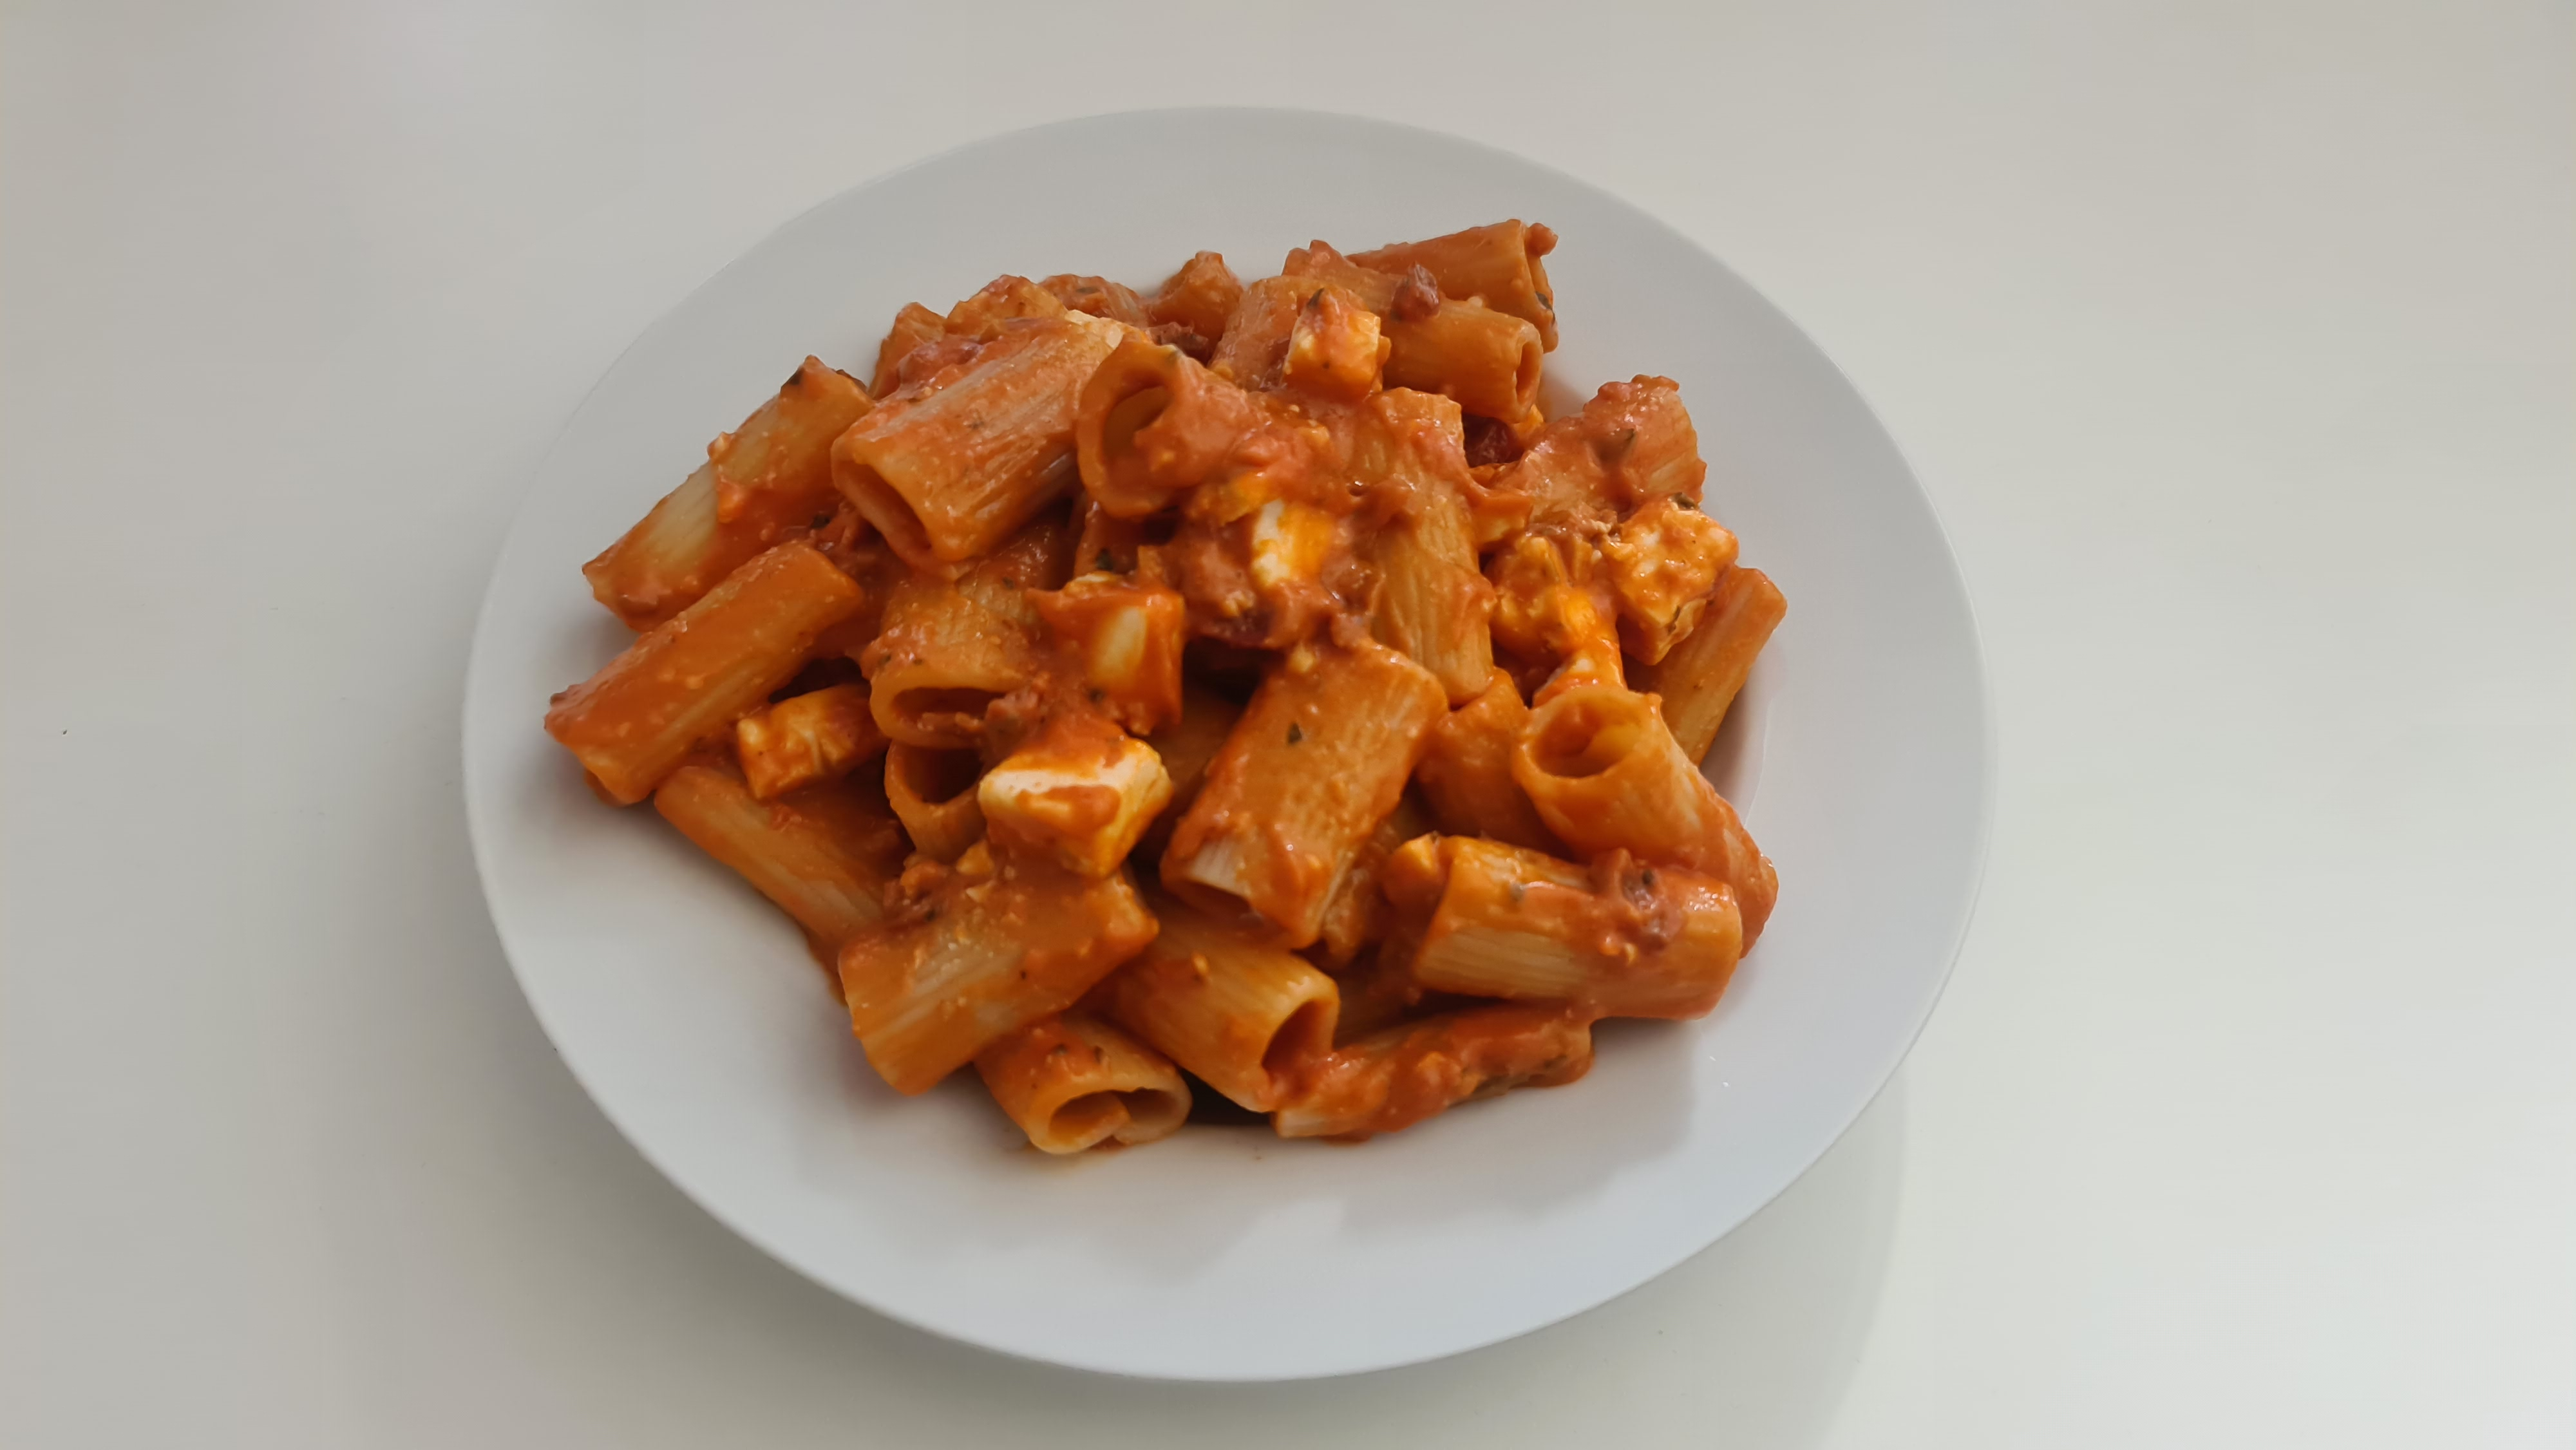 https://foodloader.net/Holz_2020-05-03_Rigatoni_Rosso.jpg